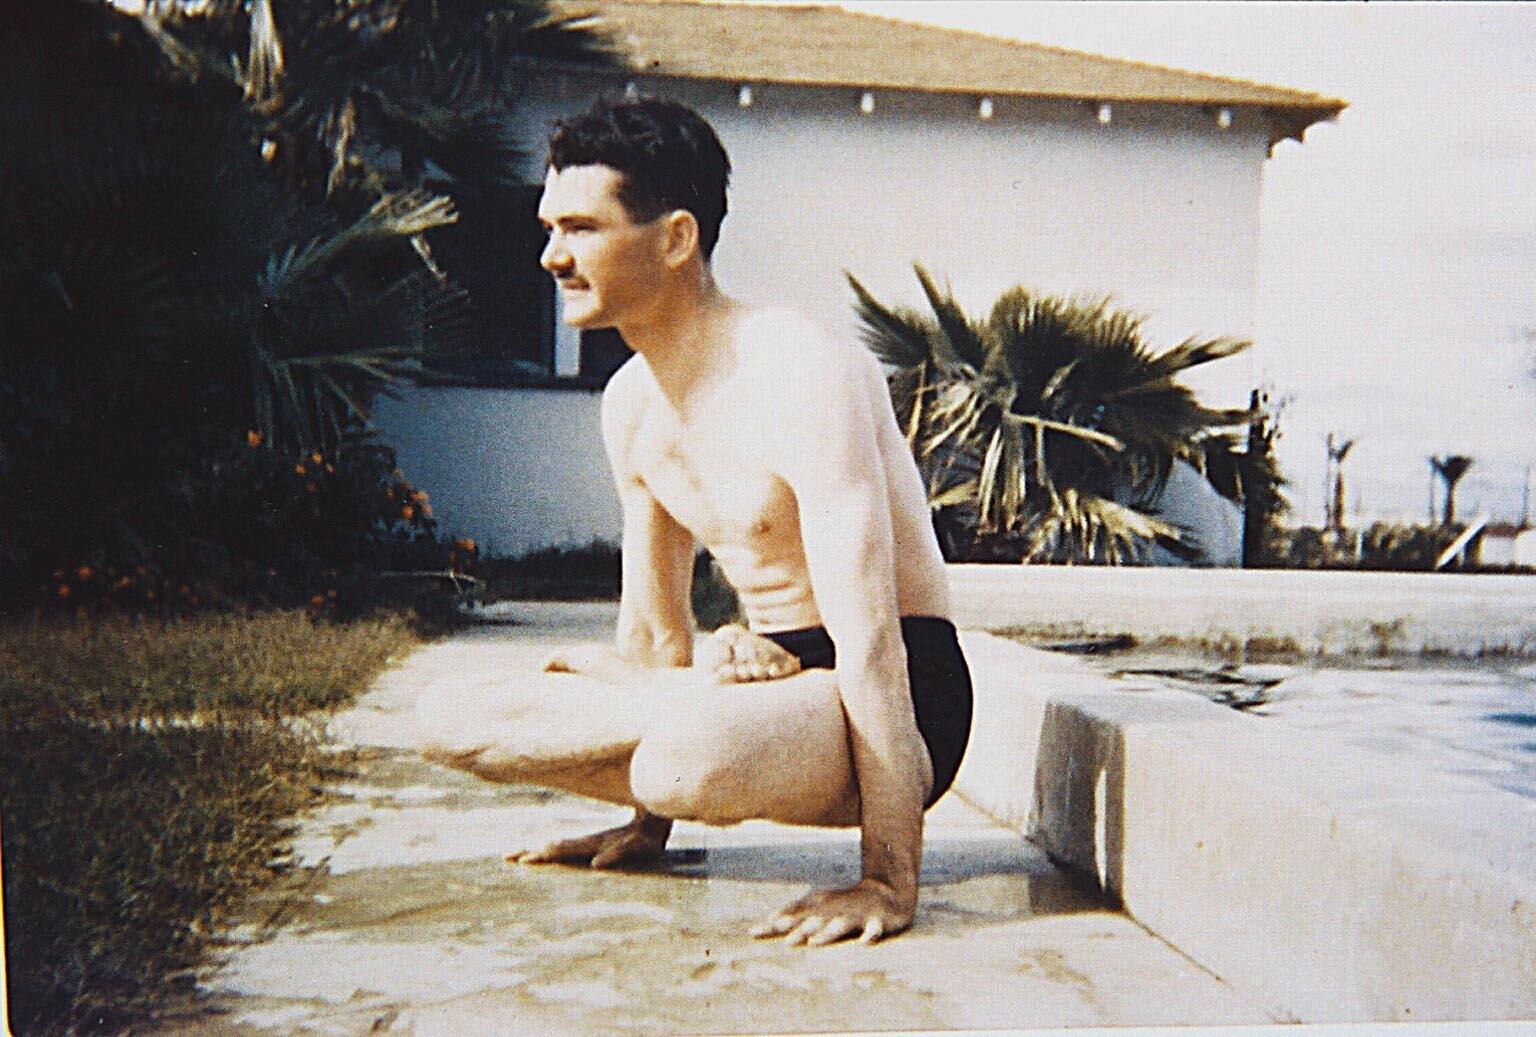 early s grady mcmurtry in yogic pose the grady mcmurtry project 1940s grady mcmurtry in yogic pose